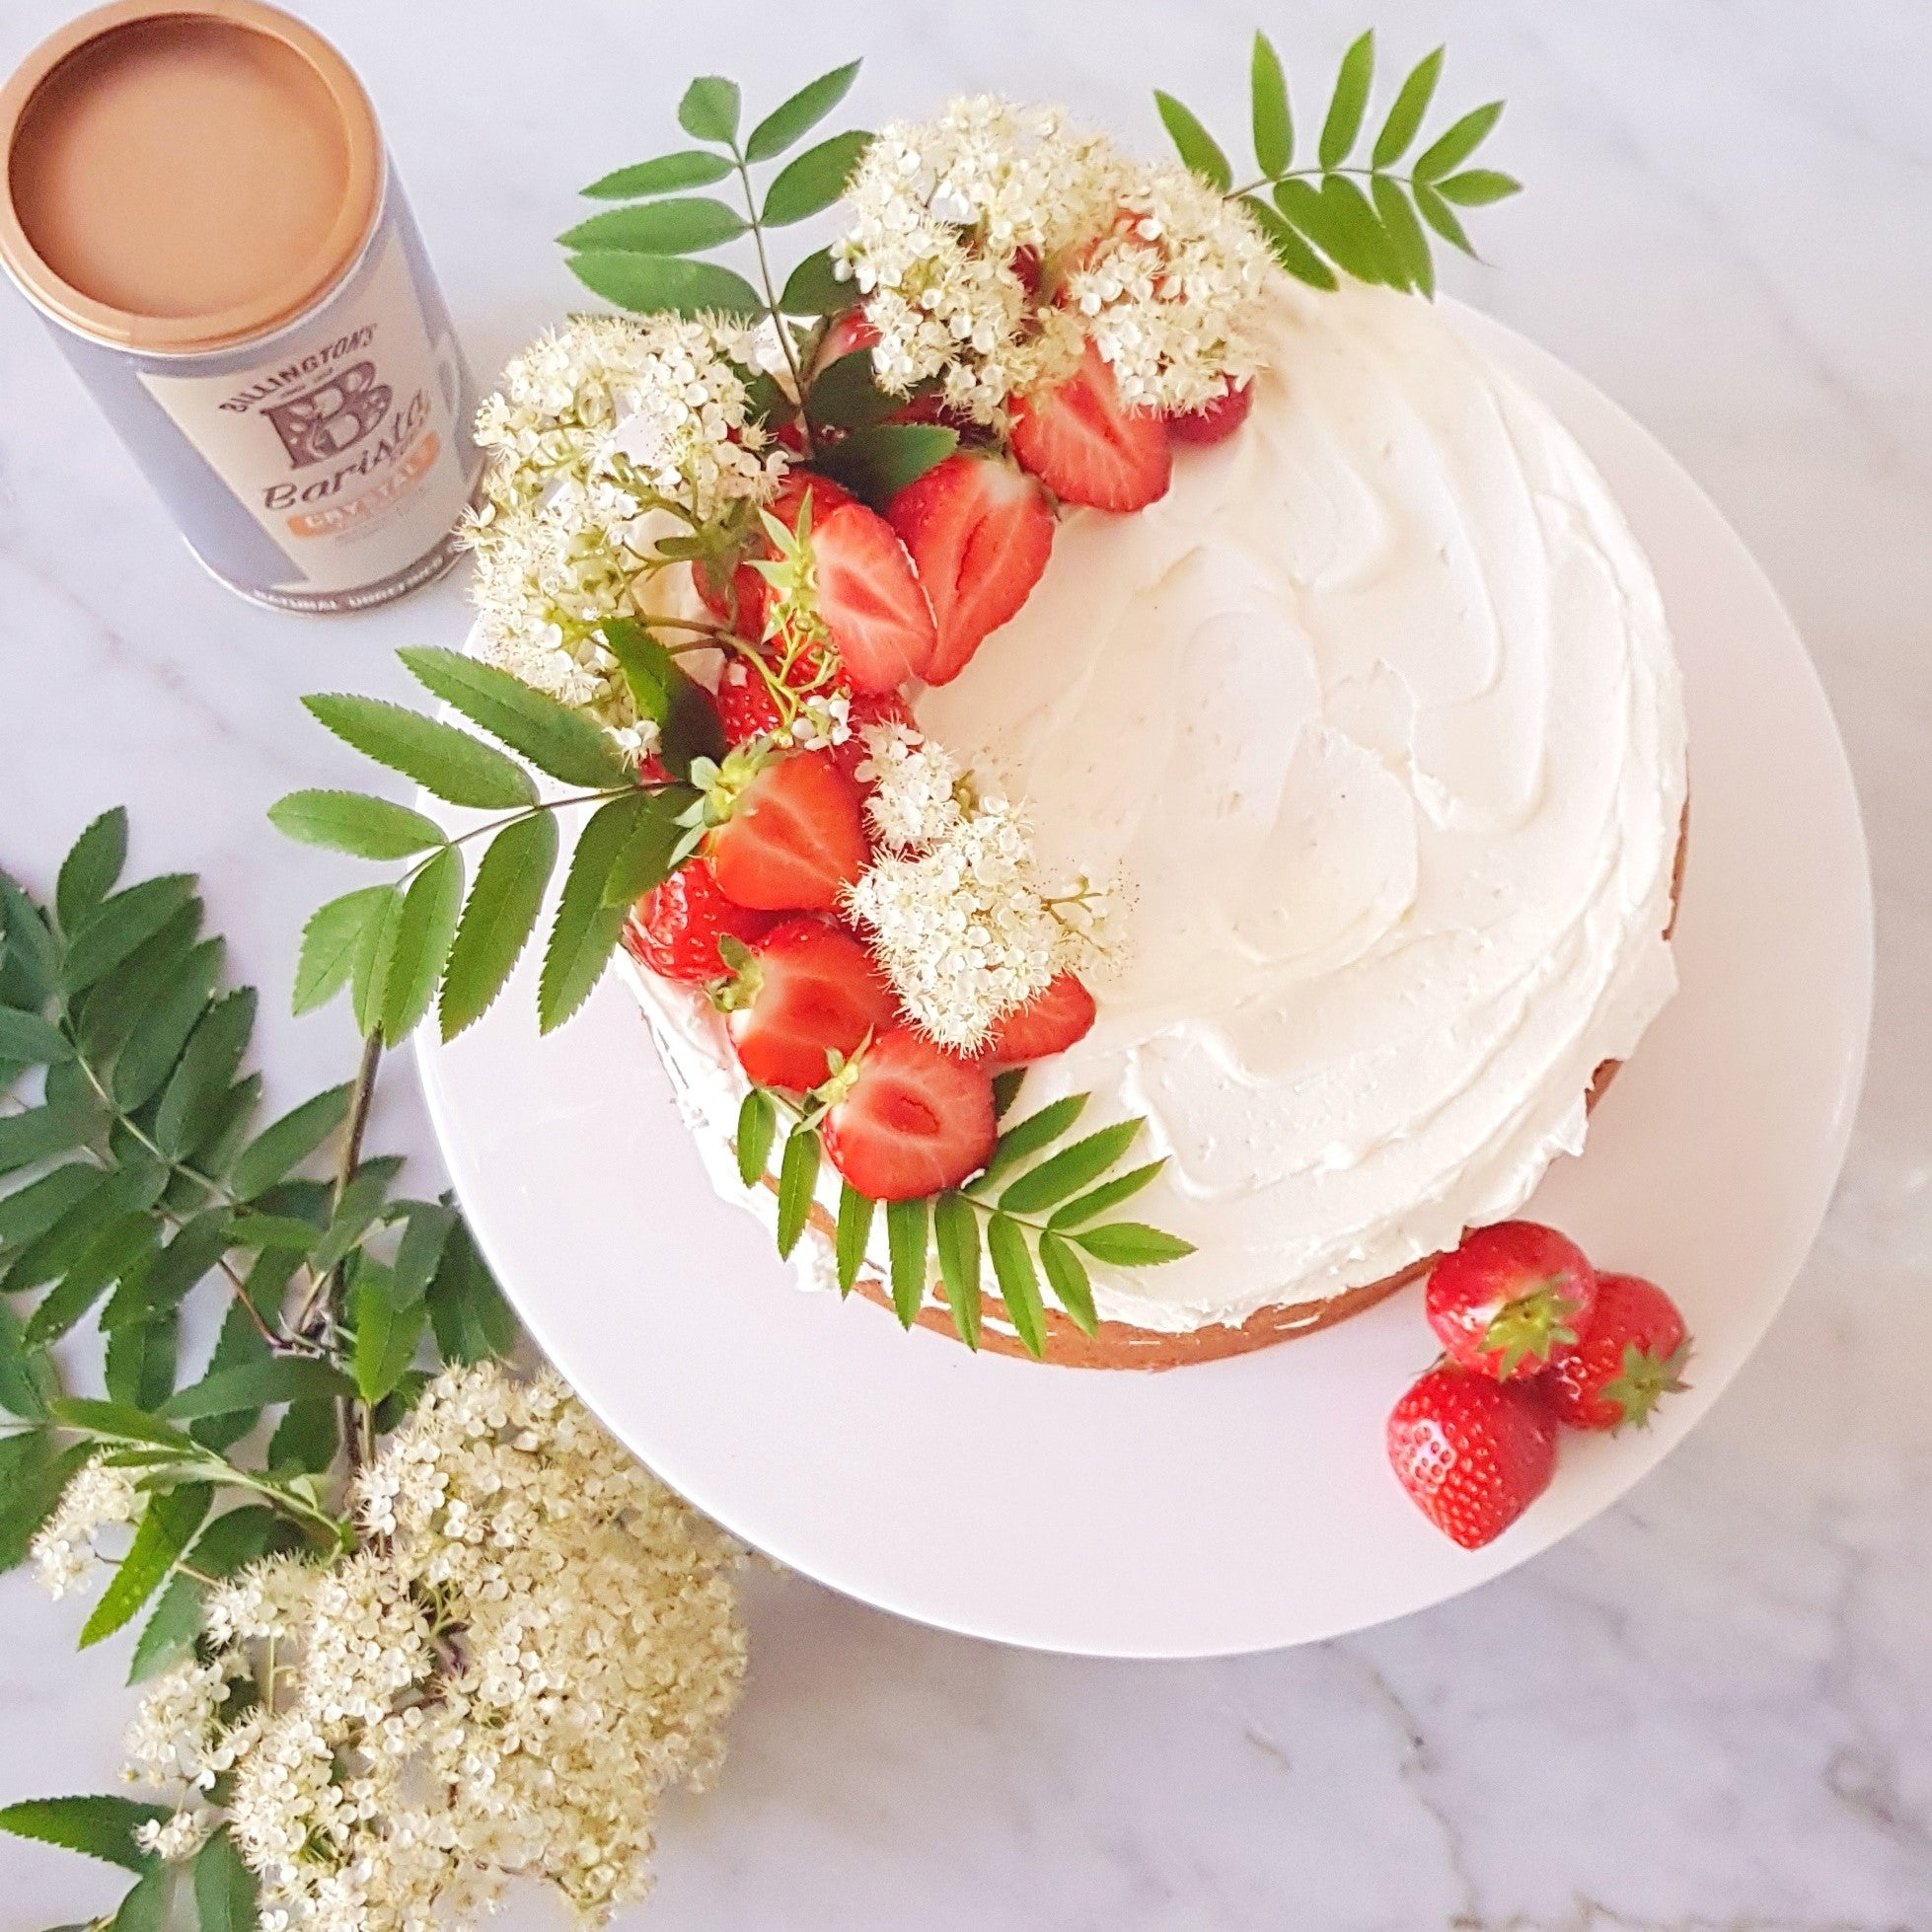 Ultimate-Summer-Berry-Cake-Lily-Vanilli-(5)_1.jpeg